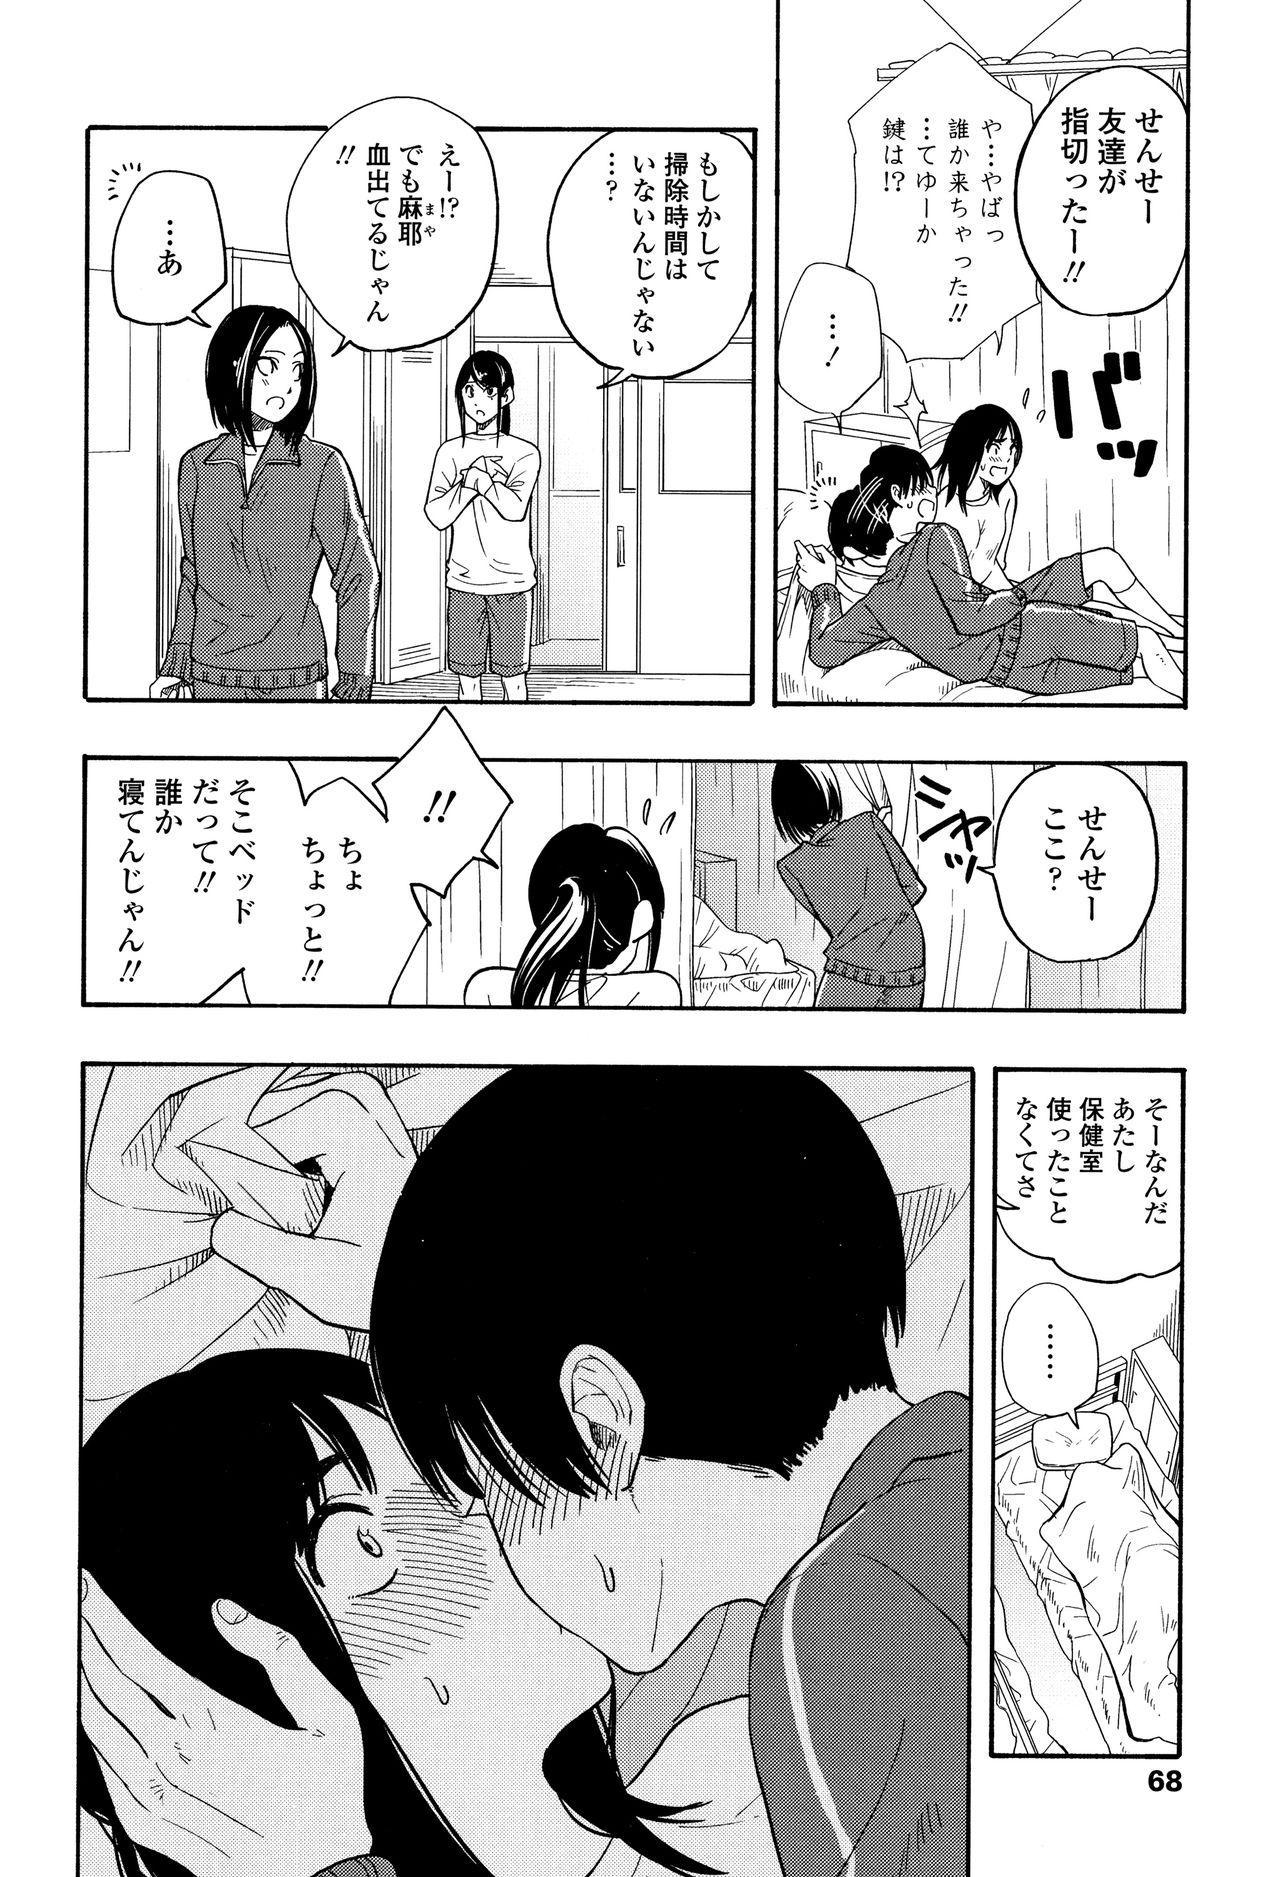 Shishunki no Eros - puberty eros 70